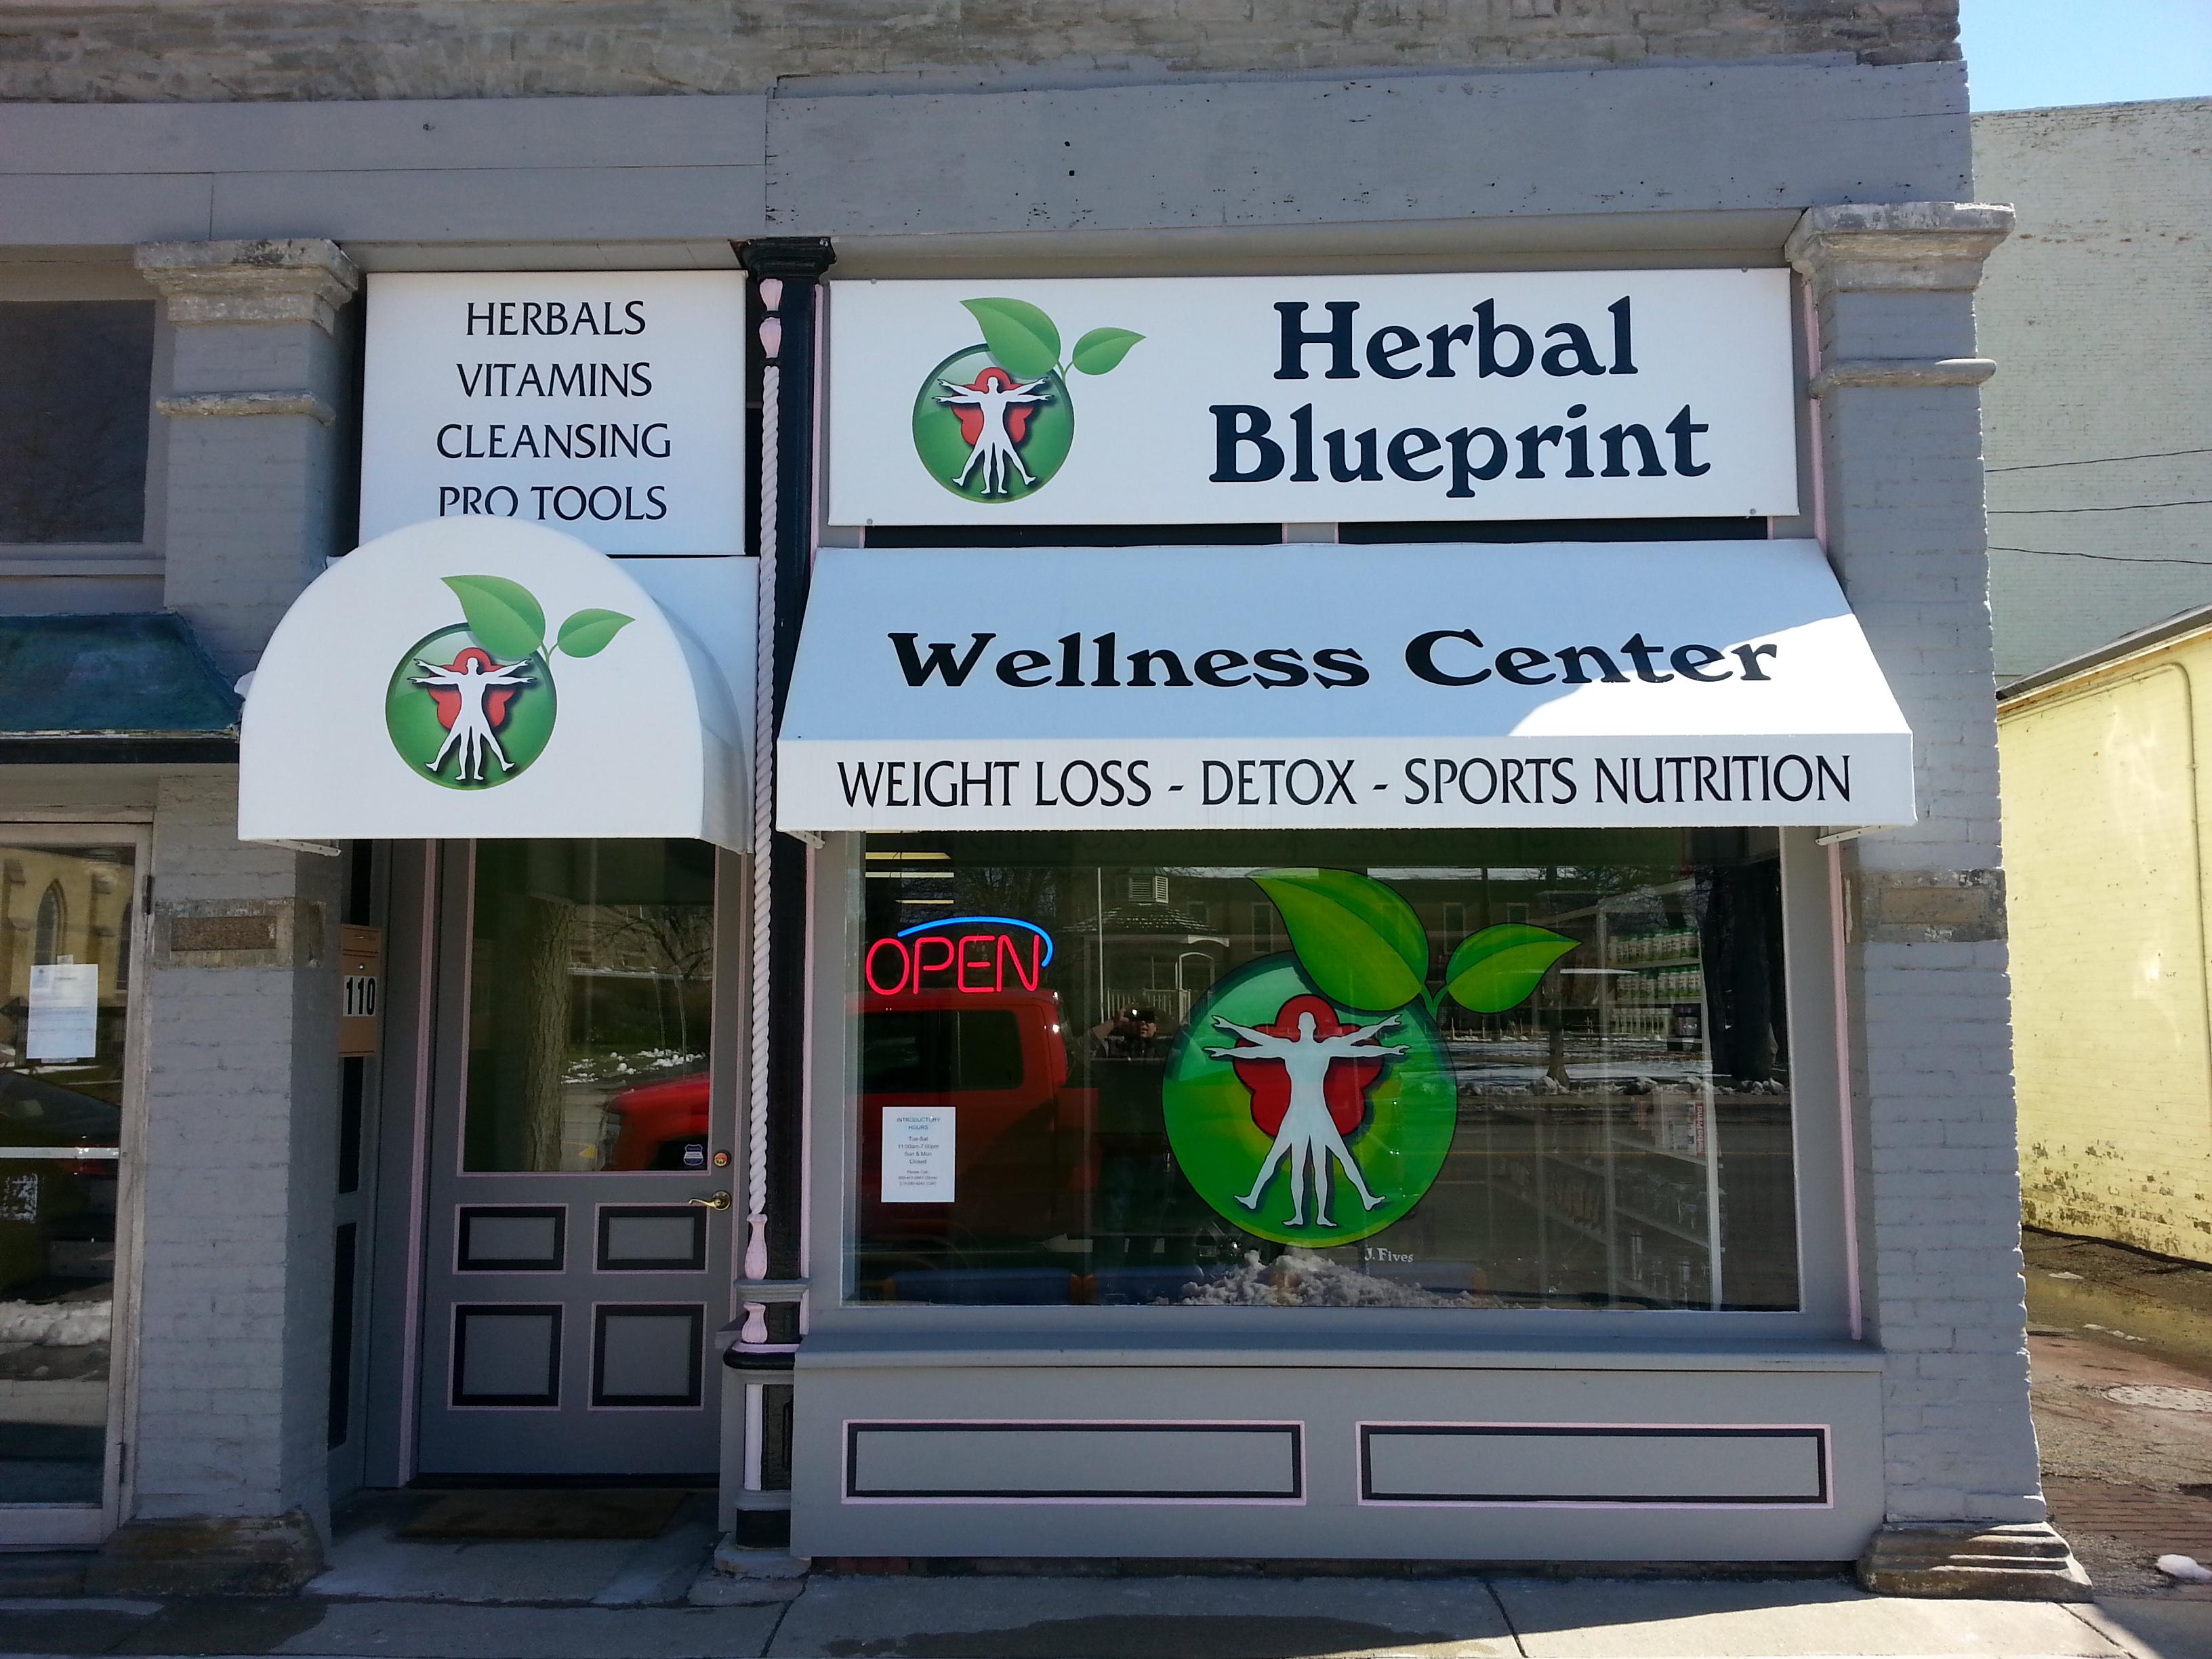 Herbal blueprint 110 n michigan ave saginaw mi 48602 yp malvernweather Gallery